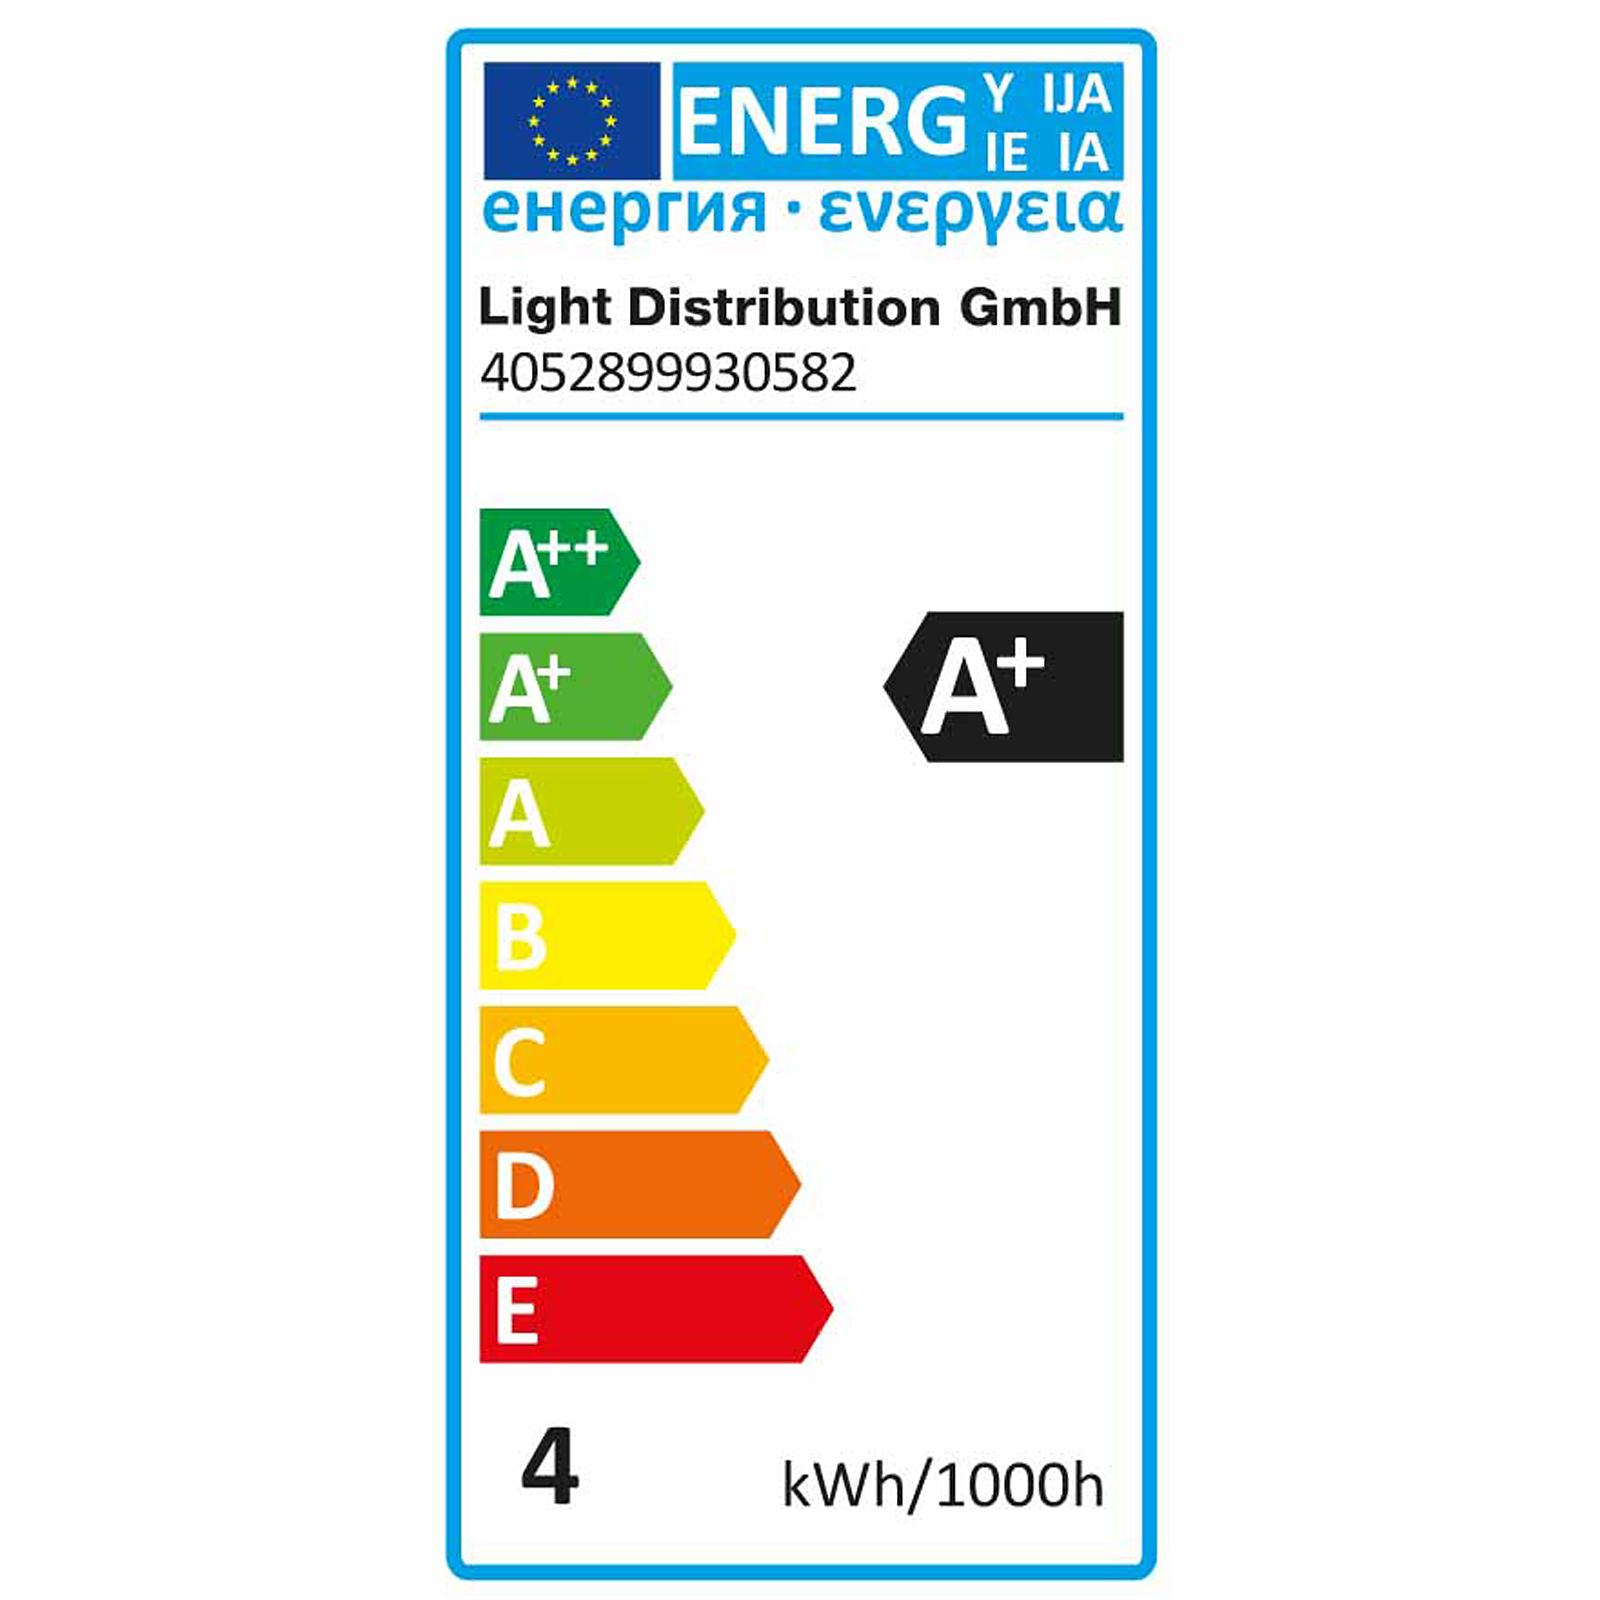 neolux led spot gu10 par16 4w ersatz f r 35 watt 230 lumen 36 warmwei ebay. Black Bedroom Furniture Sets. Home Design Ideas